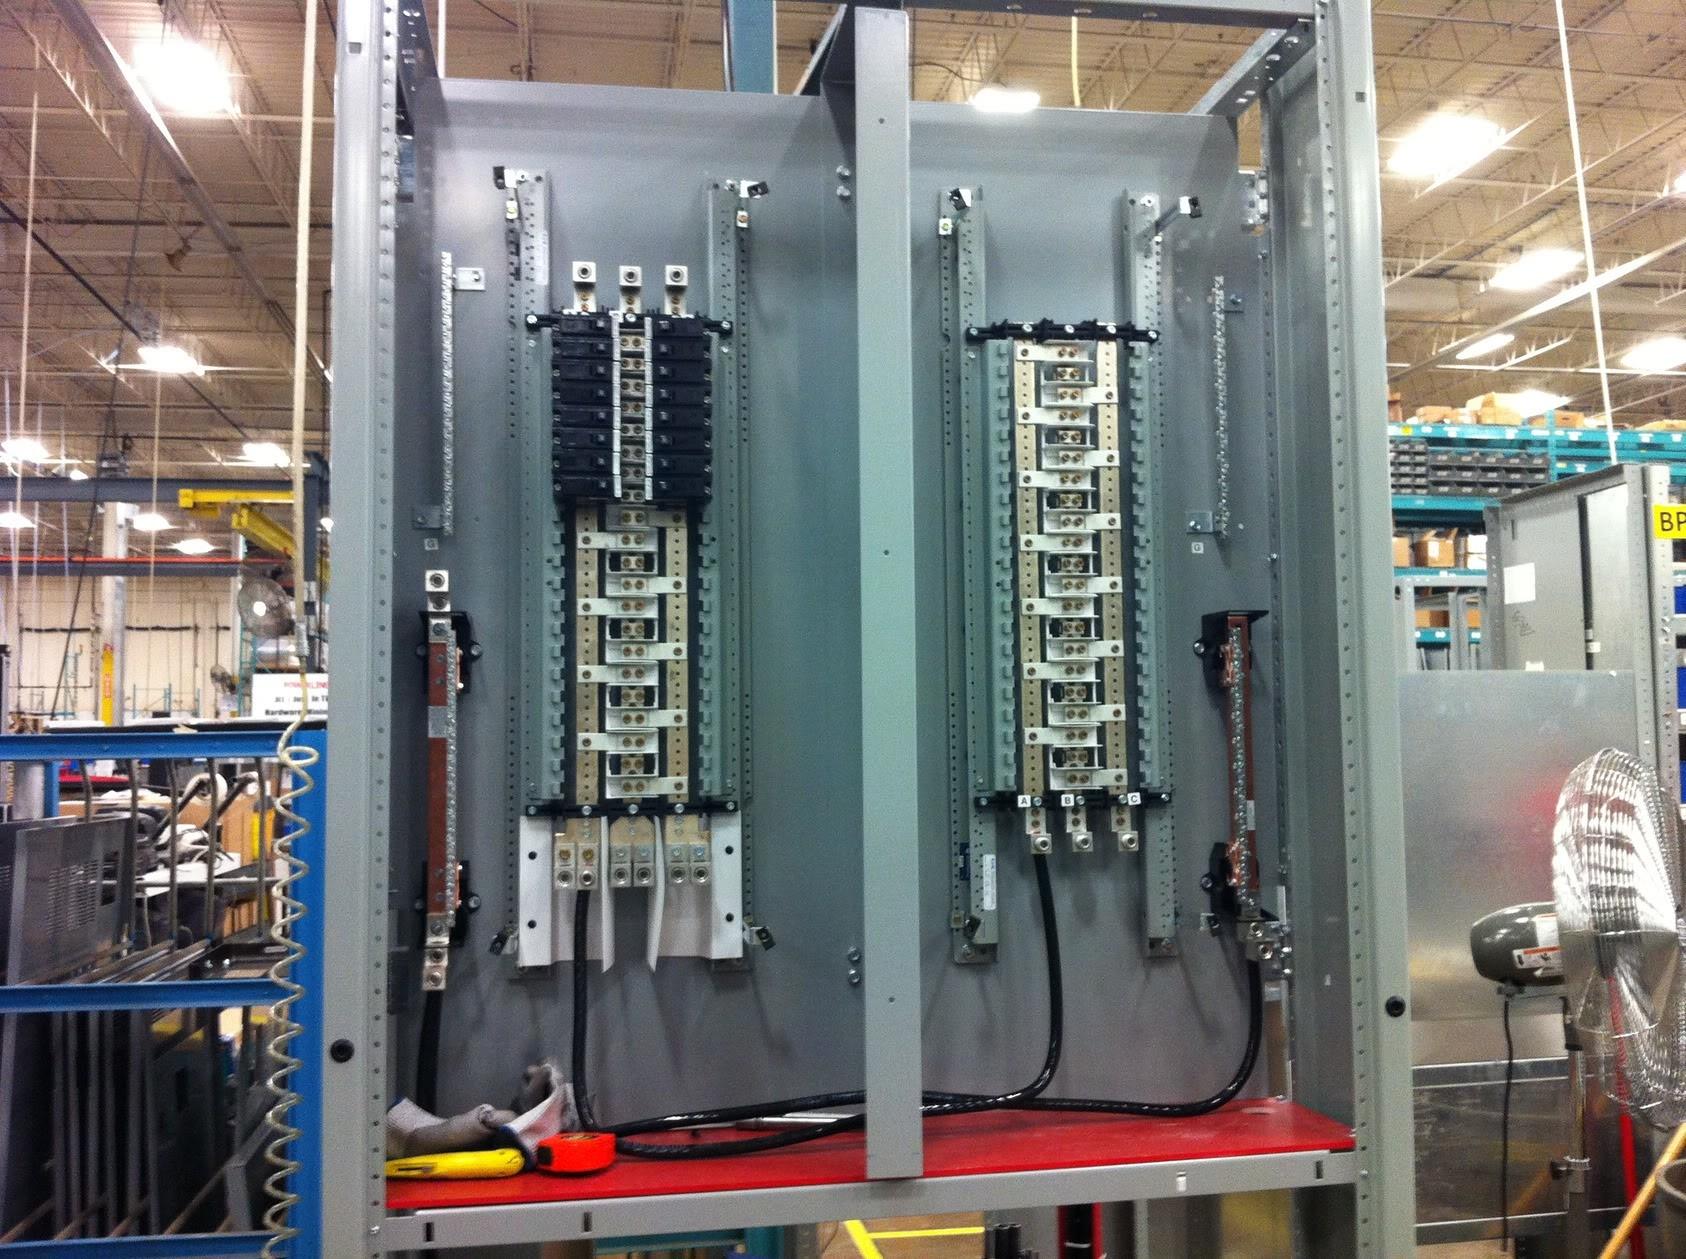 Main Lug Wiring Diagram Library Aquare D Qo Load Center Shop Square 12 Circuit 6 Space 100 Amp